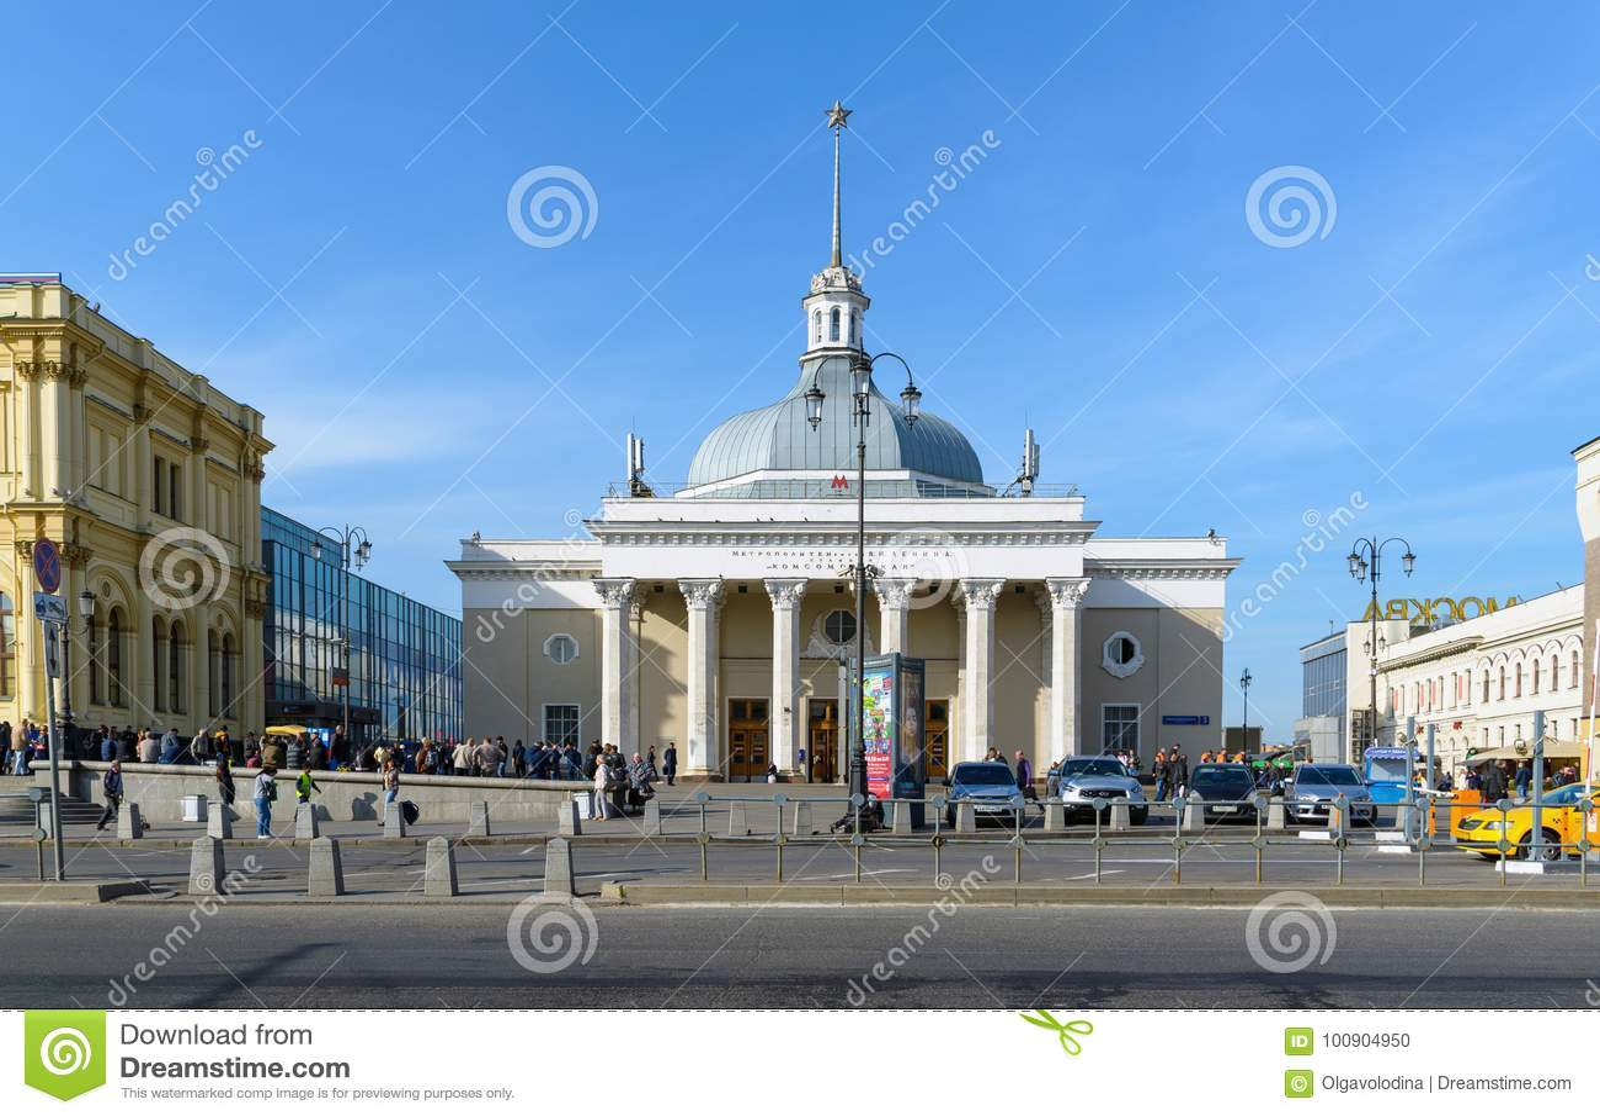 Moskau, Russland - 25. September 2017 Metrostation Komsomolskaya-Ring